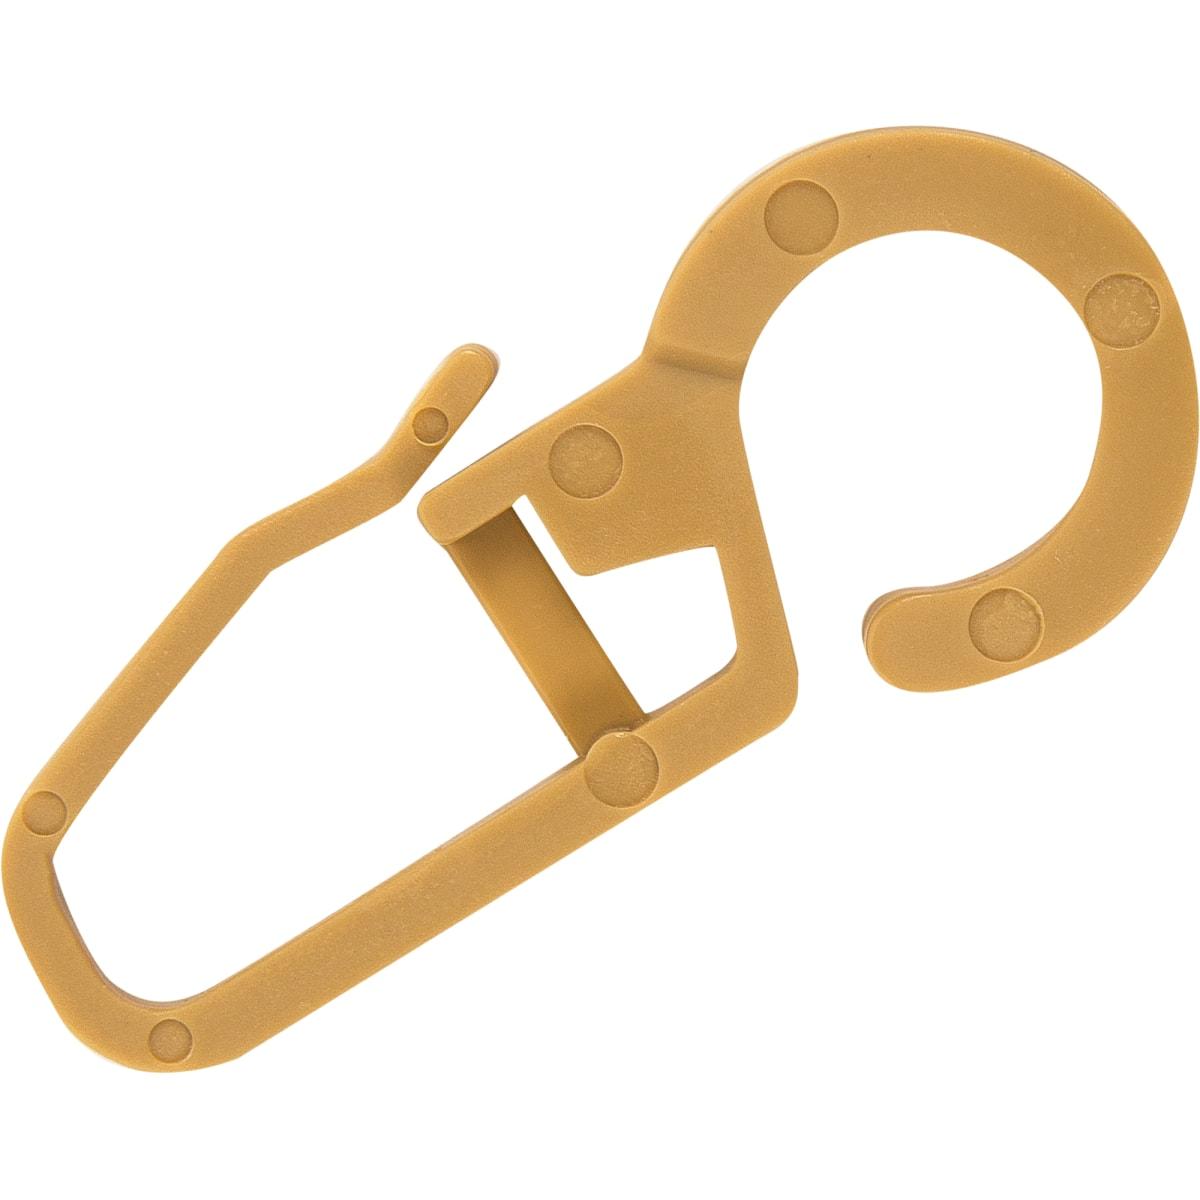 Крючок для колец 2 см цвет бежевый